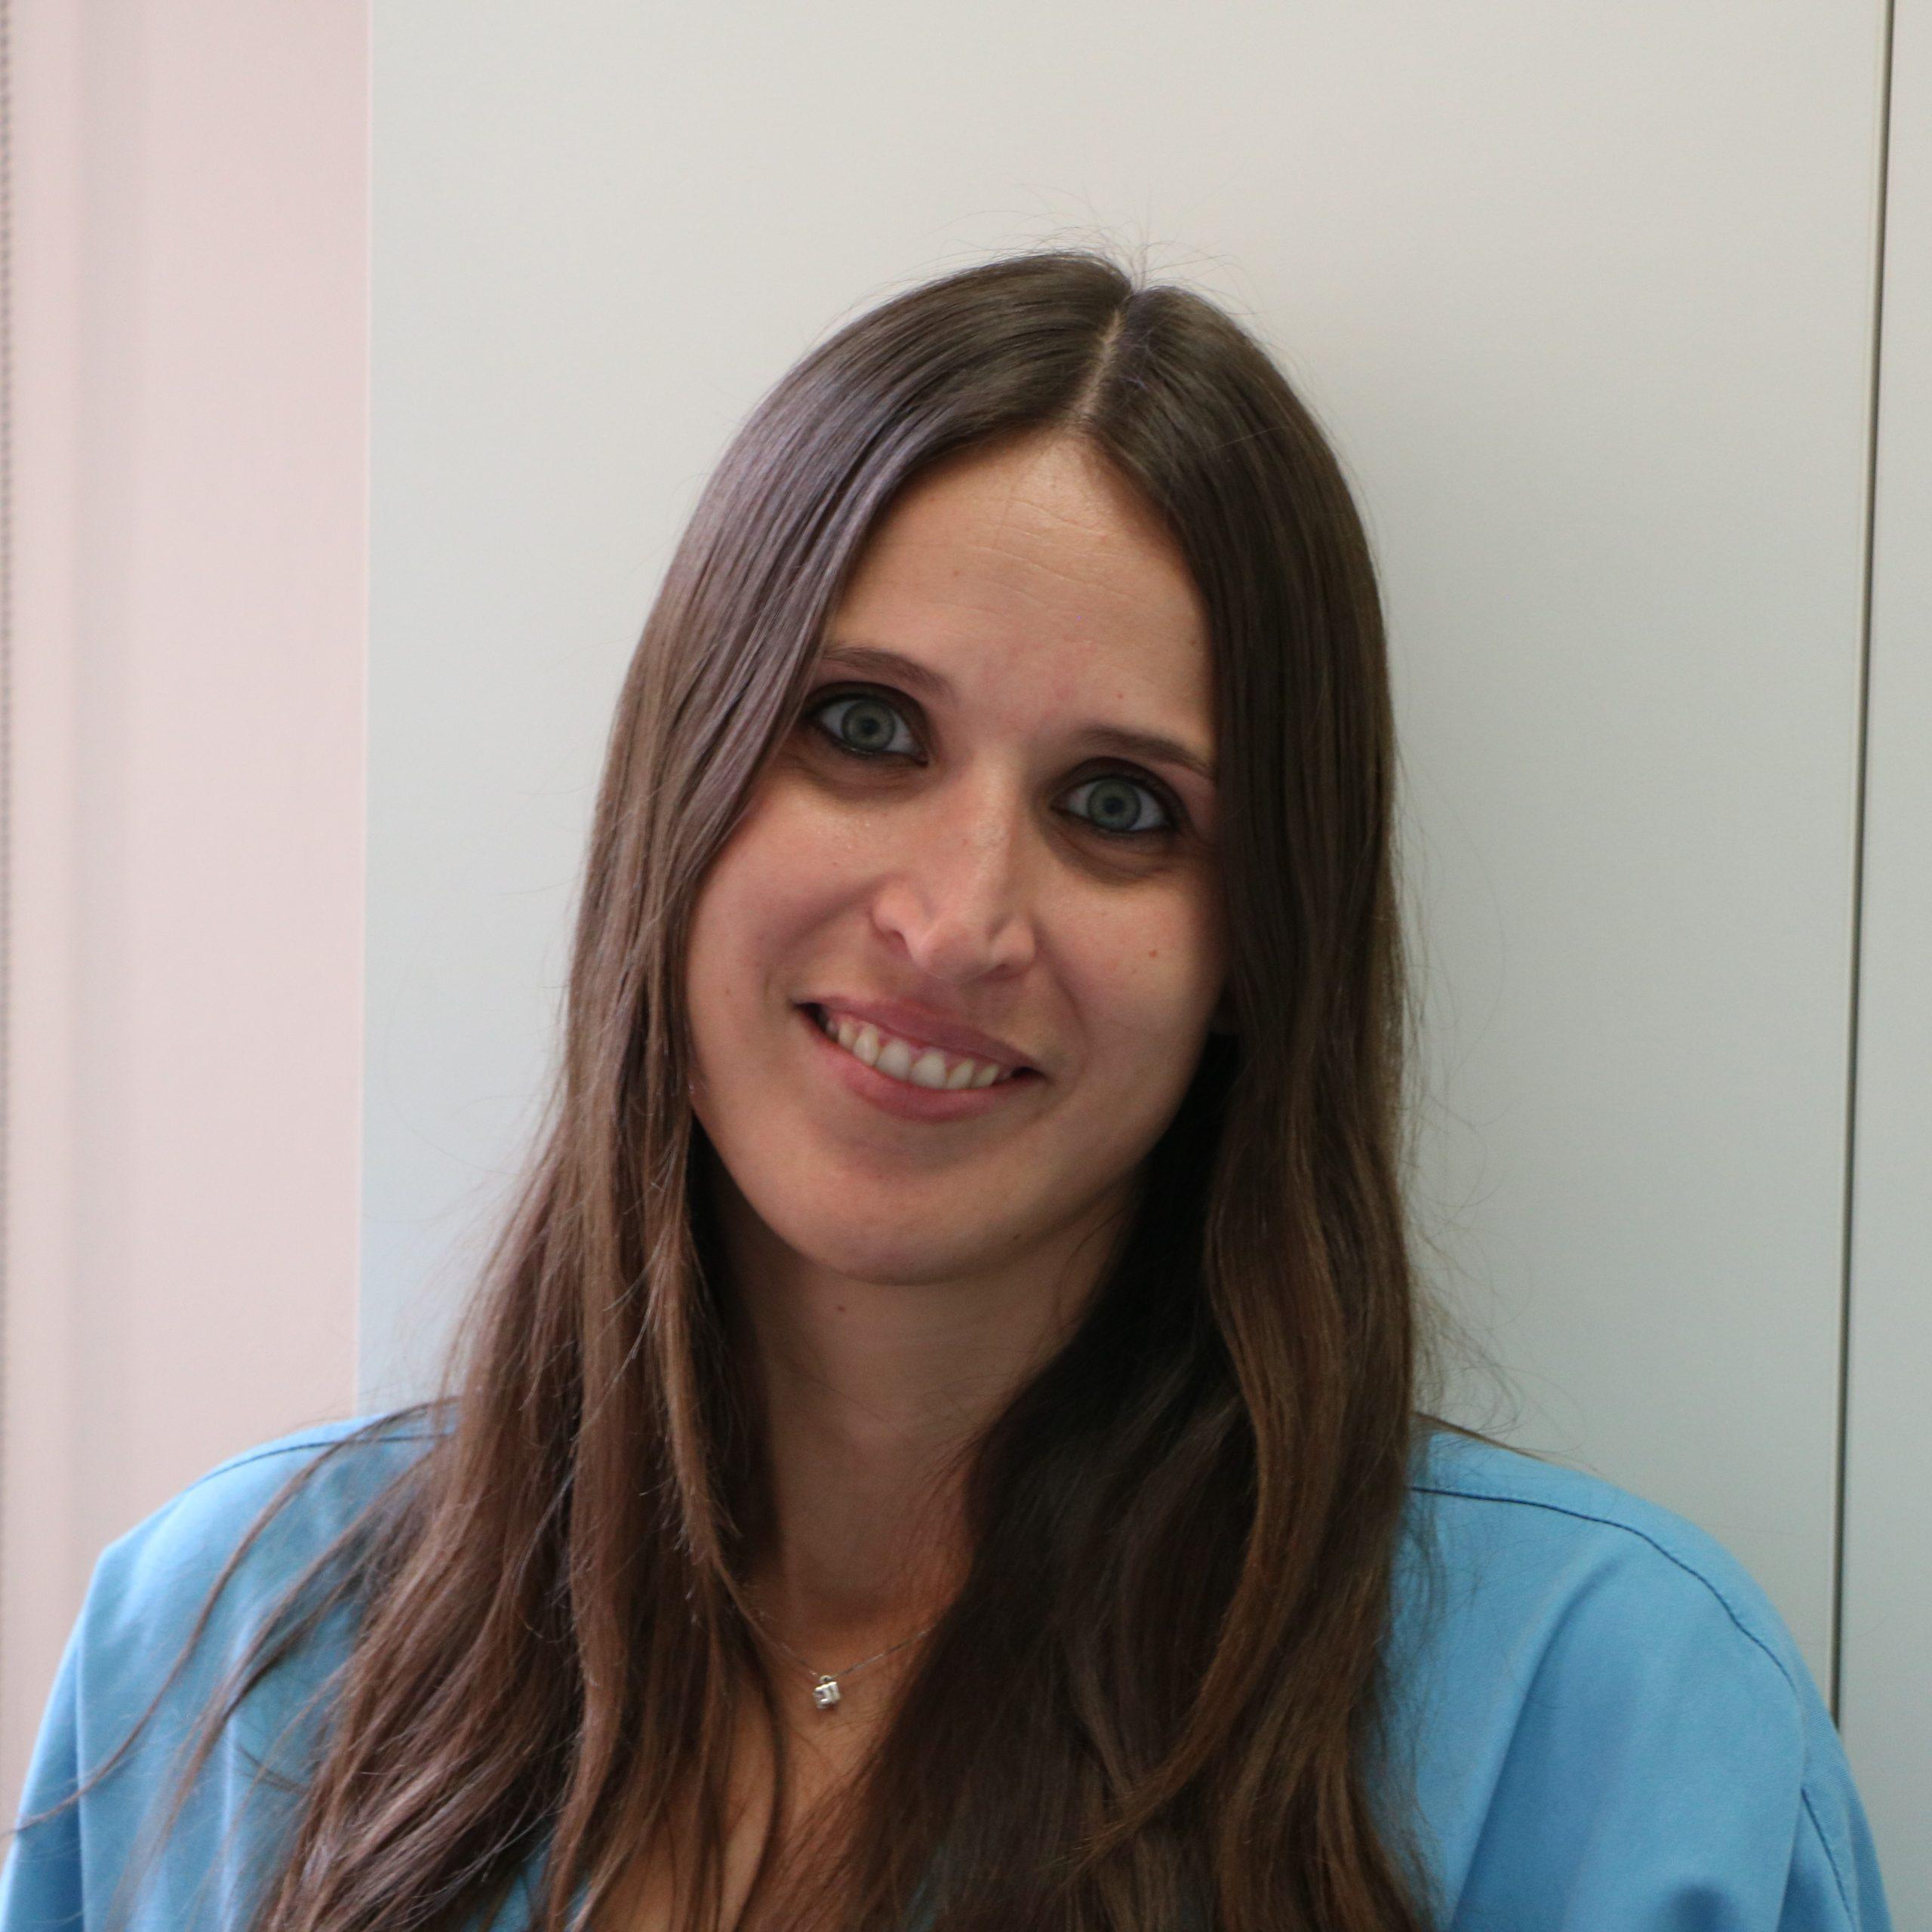 Simona Signorelli